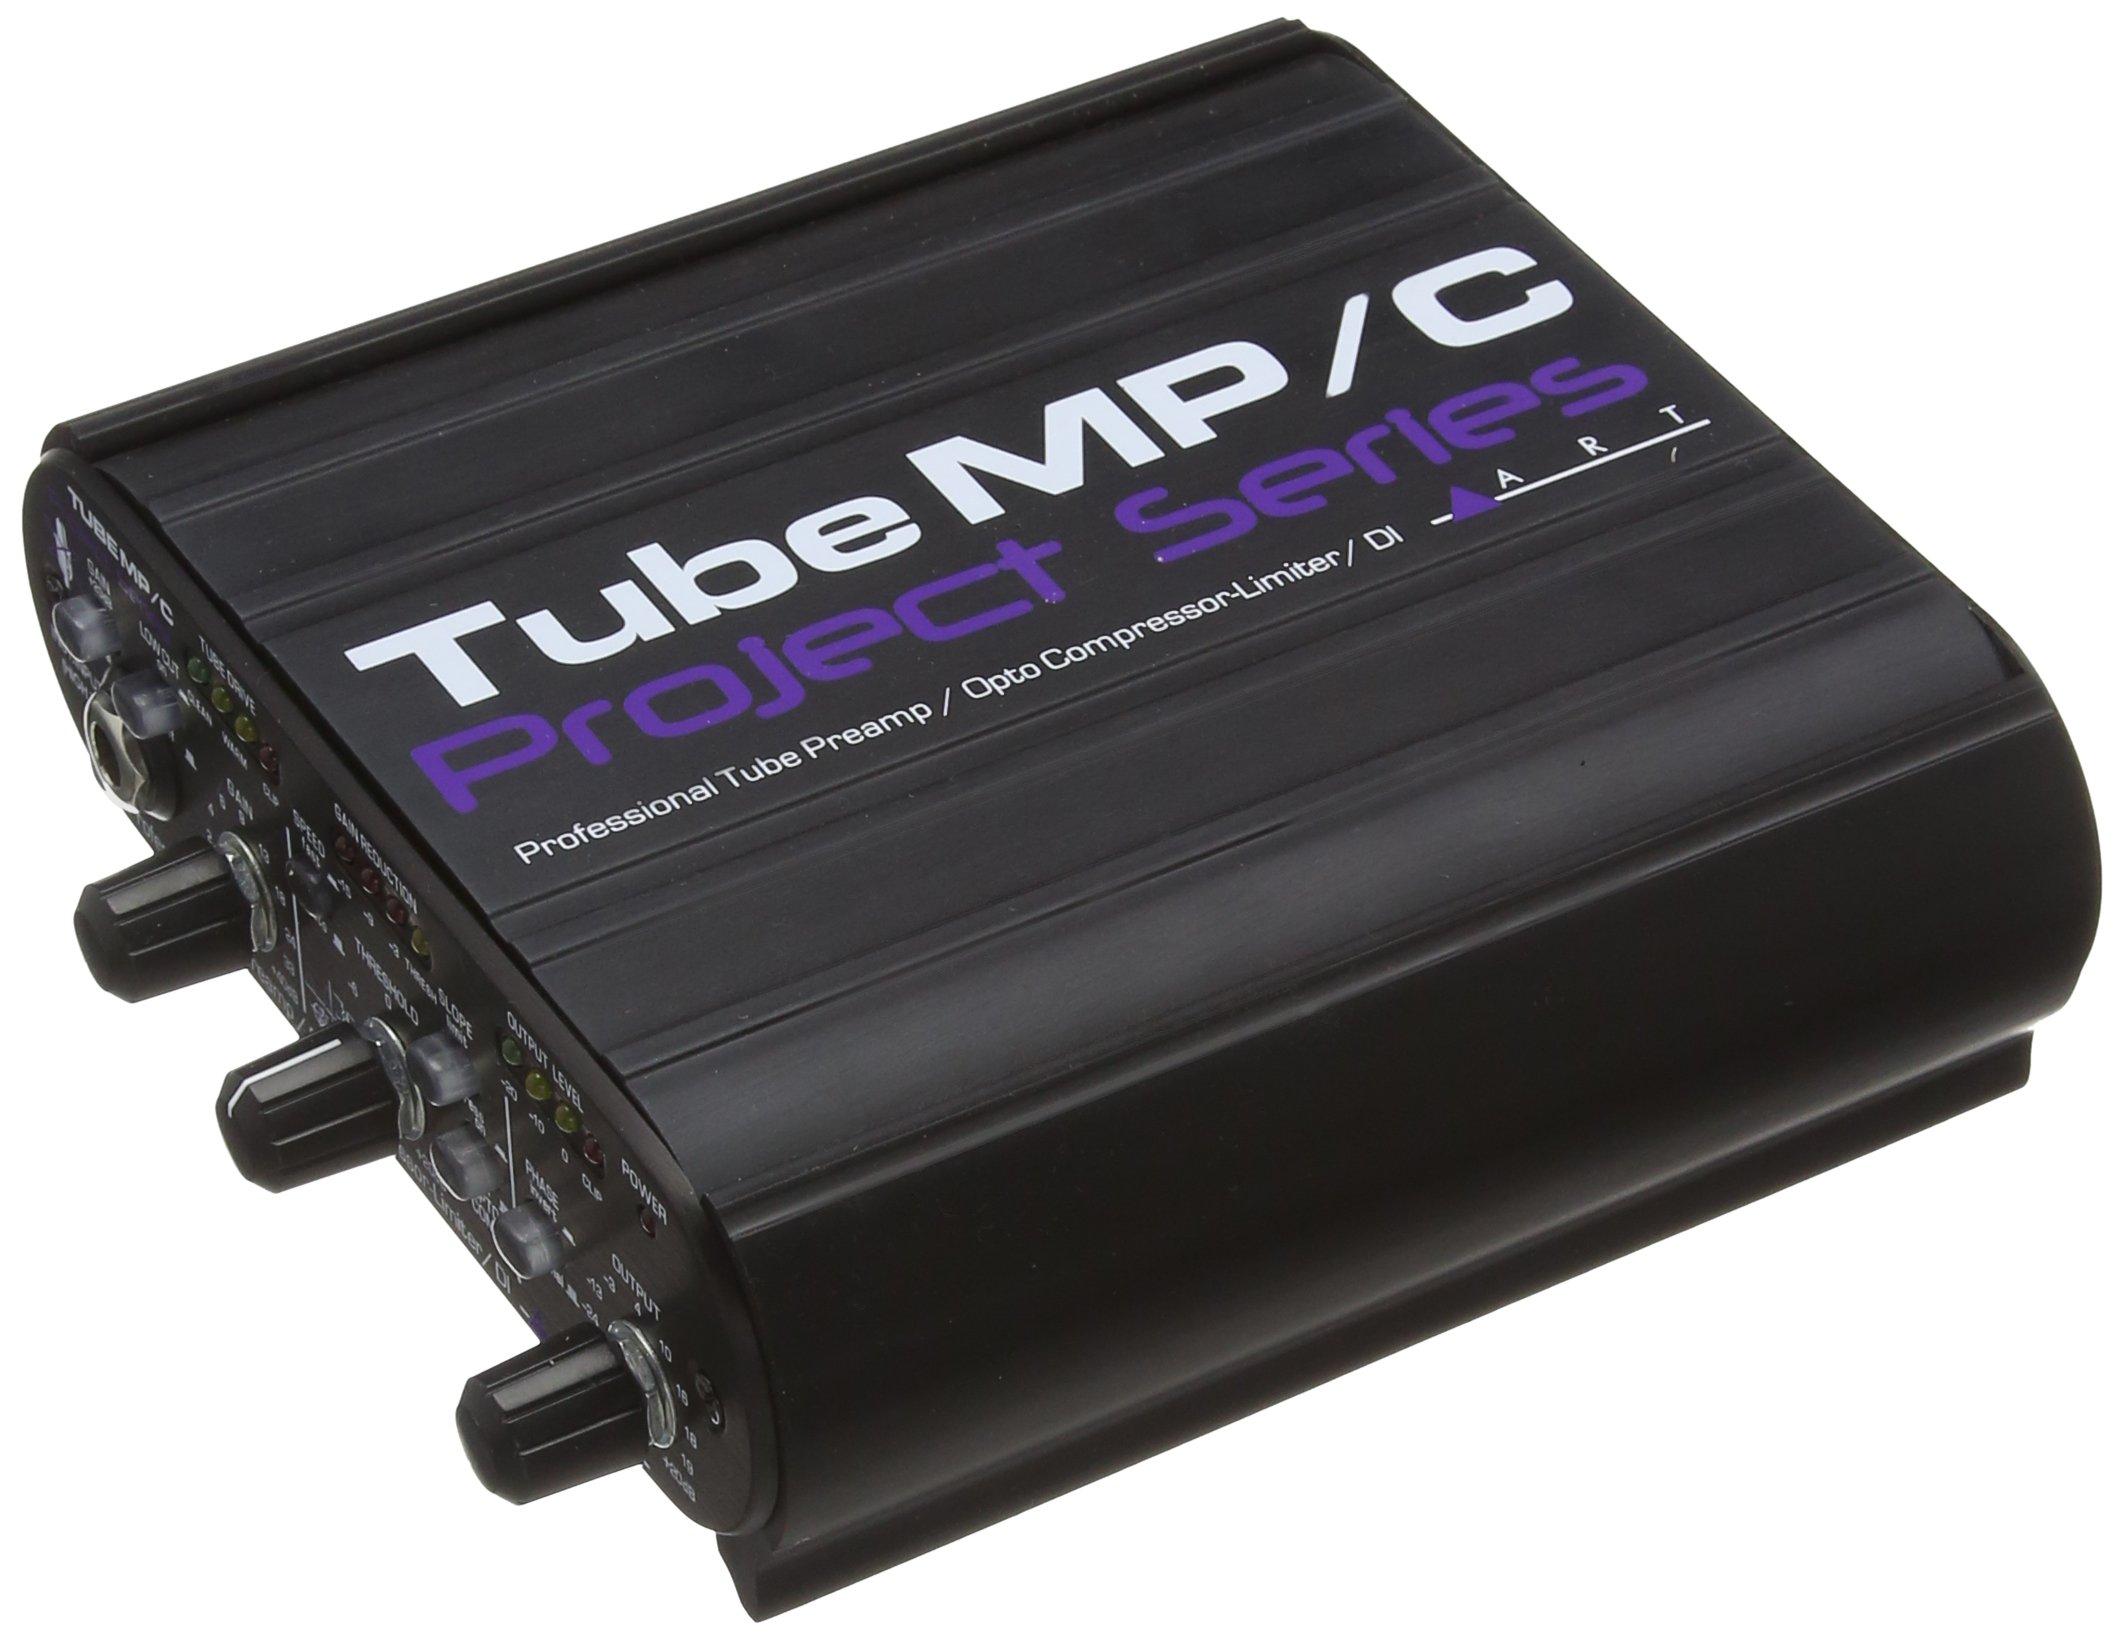 ART Tube MP/C Tube Pre-Amplifier/Opto-Compressor-Limiter Project Series